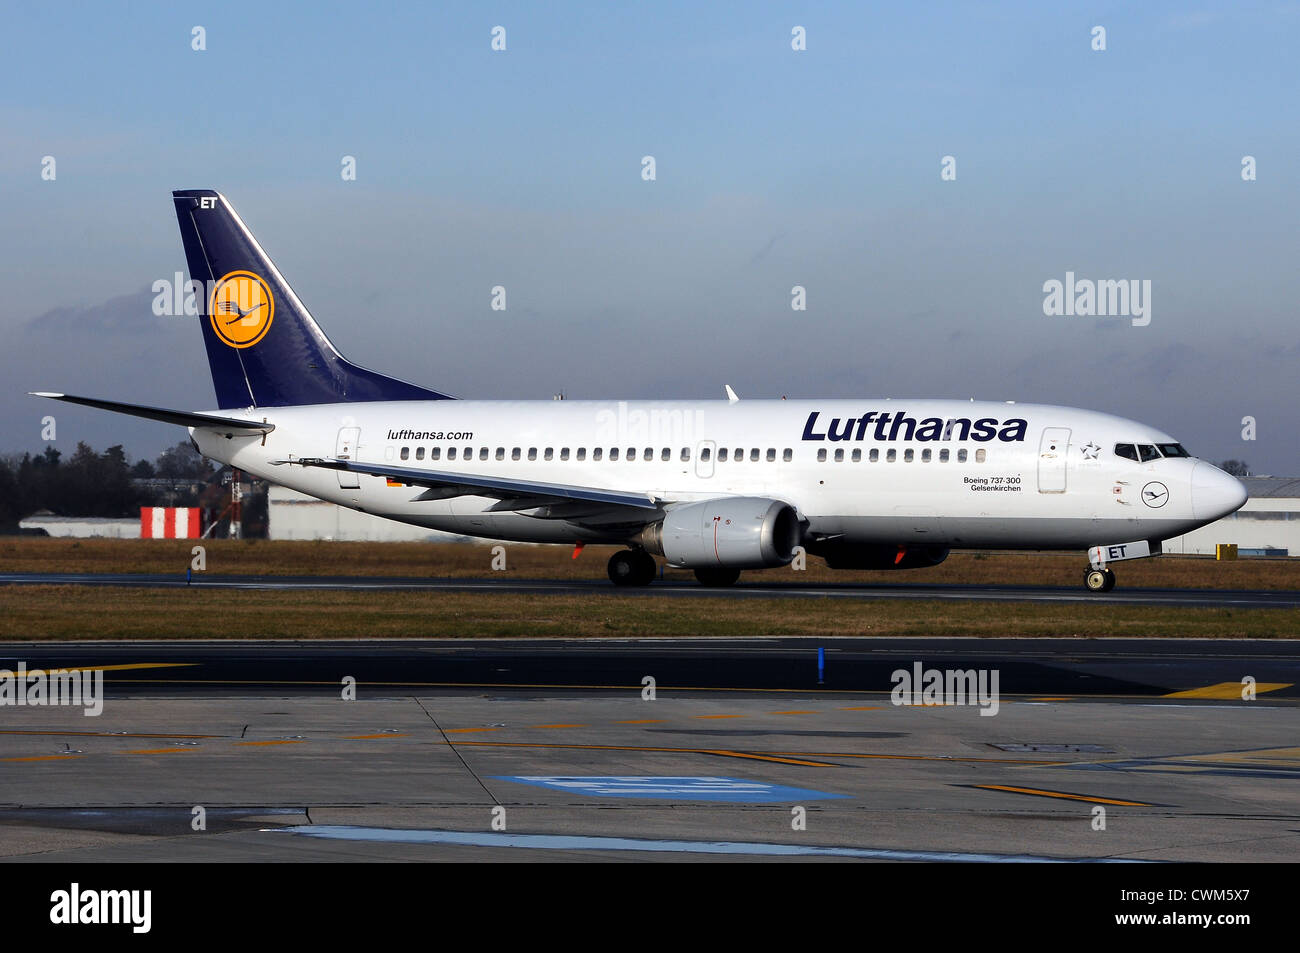 Lufthansa Boeing 737 - Stock Image